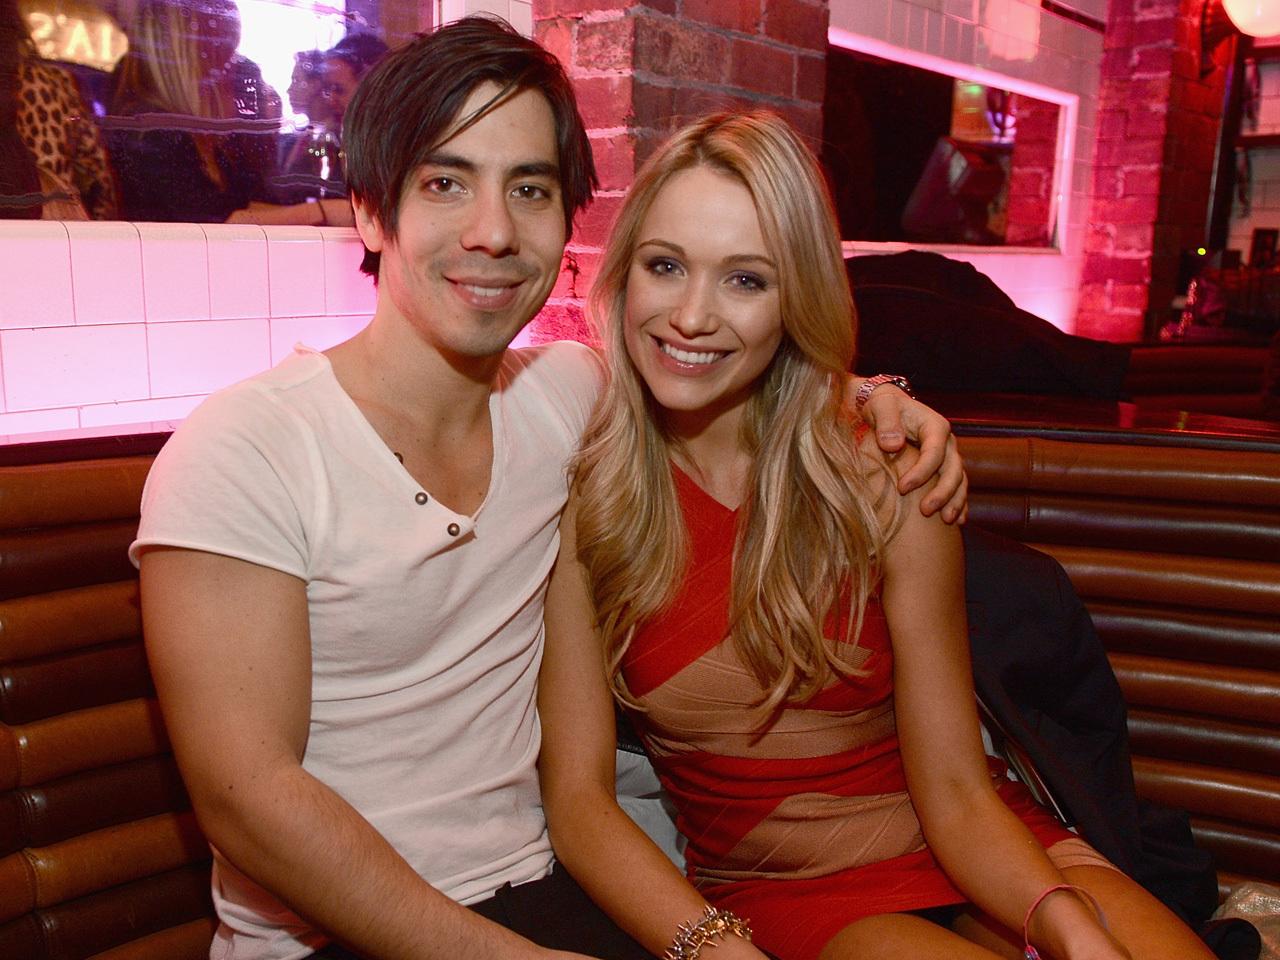 """30 Rock"" star Katrina Bowden marries rocker Ben Jorgensen"